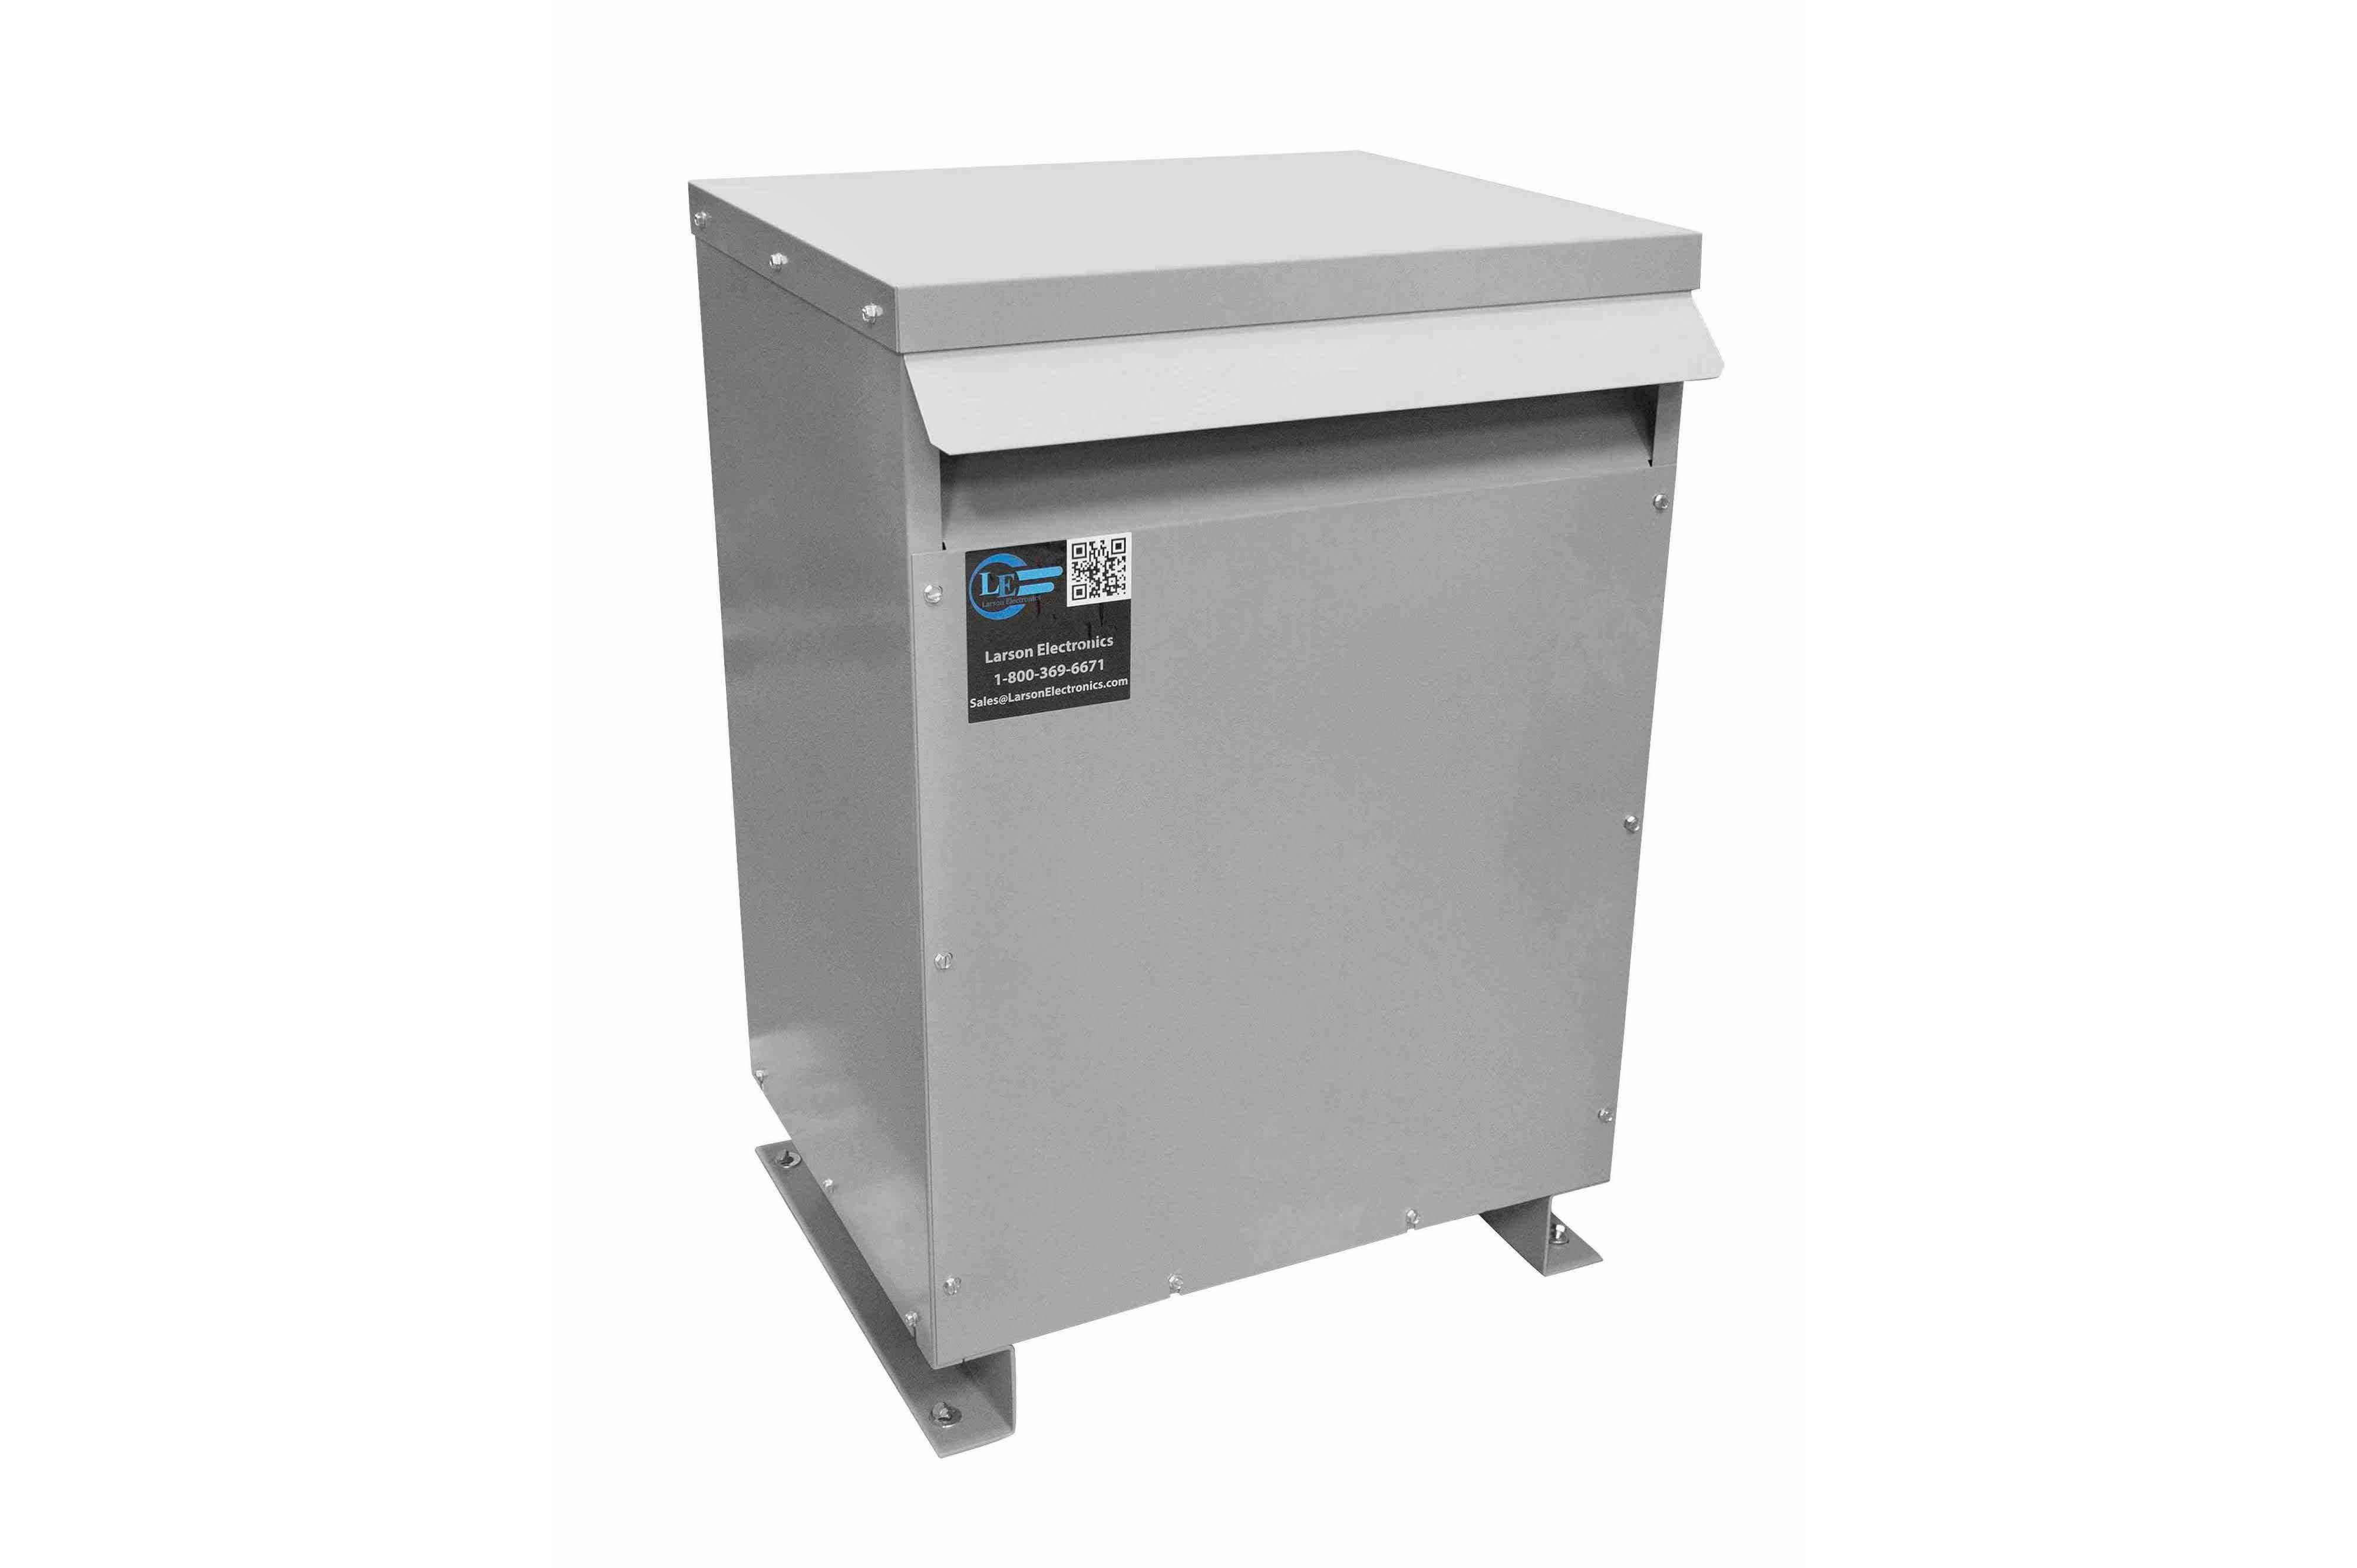 9 kVA 3PH Isolation Transformer, 230V Wye Primary, 480Y/277 Wye-N Secondary, N3R, Ventilated, 60 Hz